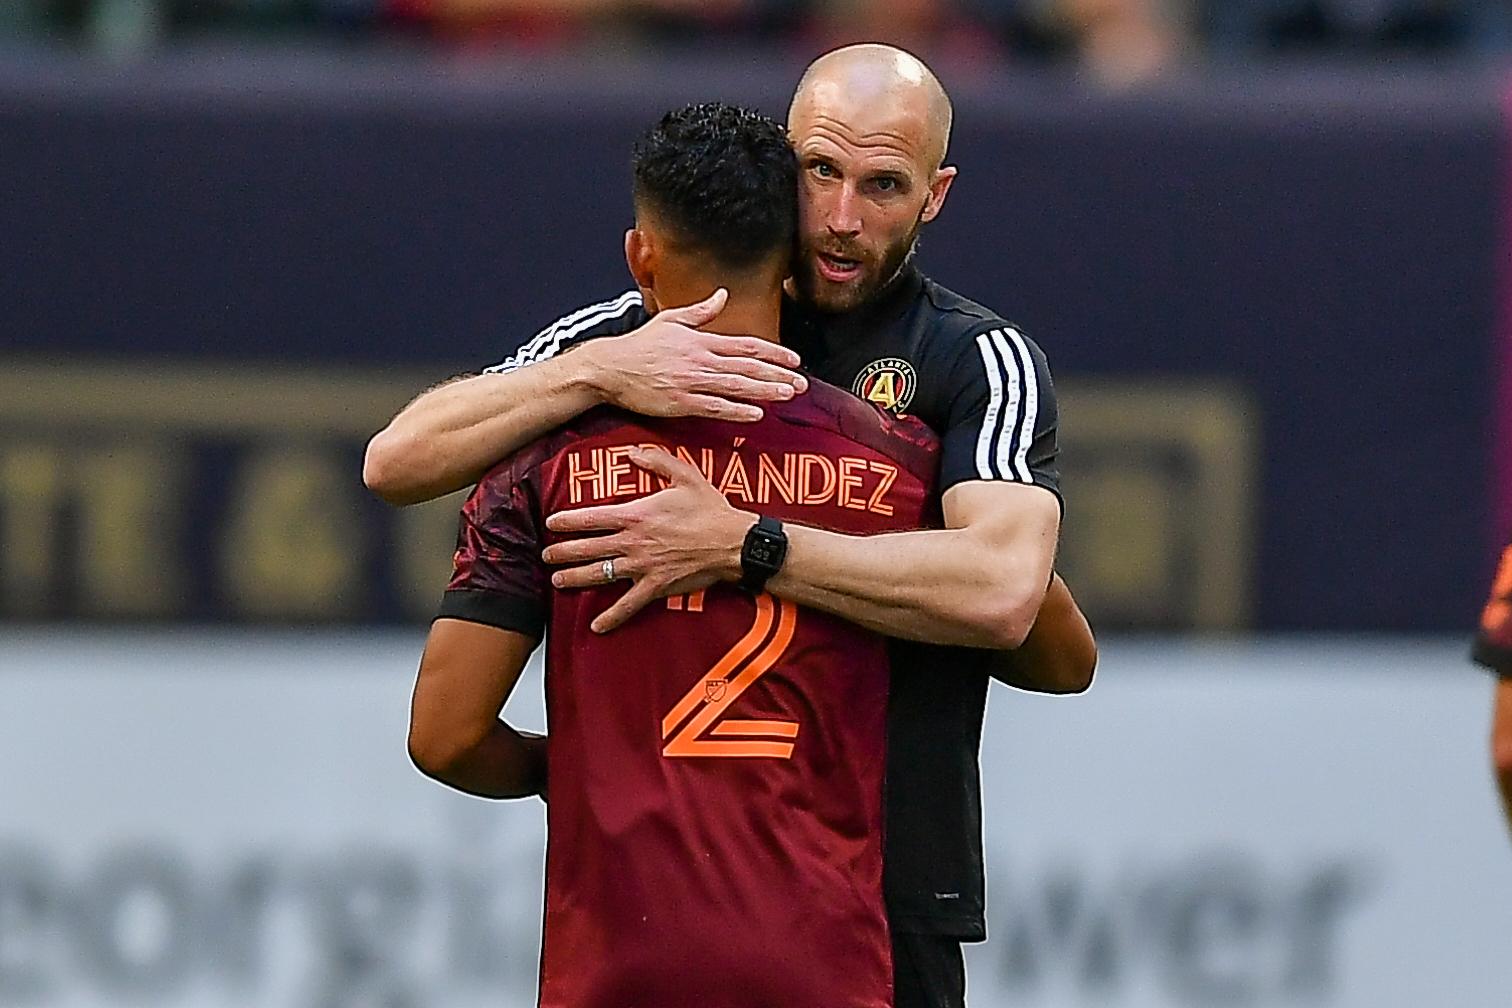 SOCCER: AUG 15 MLS - LAFC at Atlanta United FC